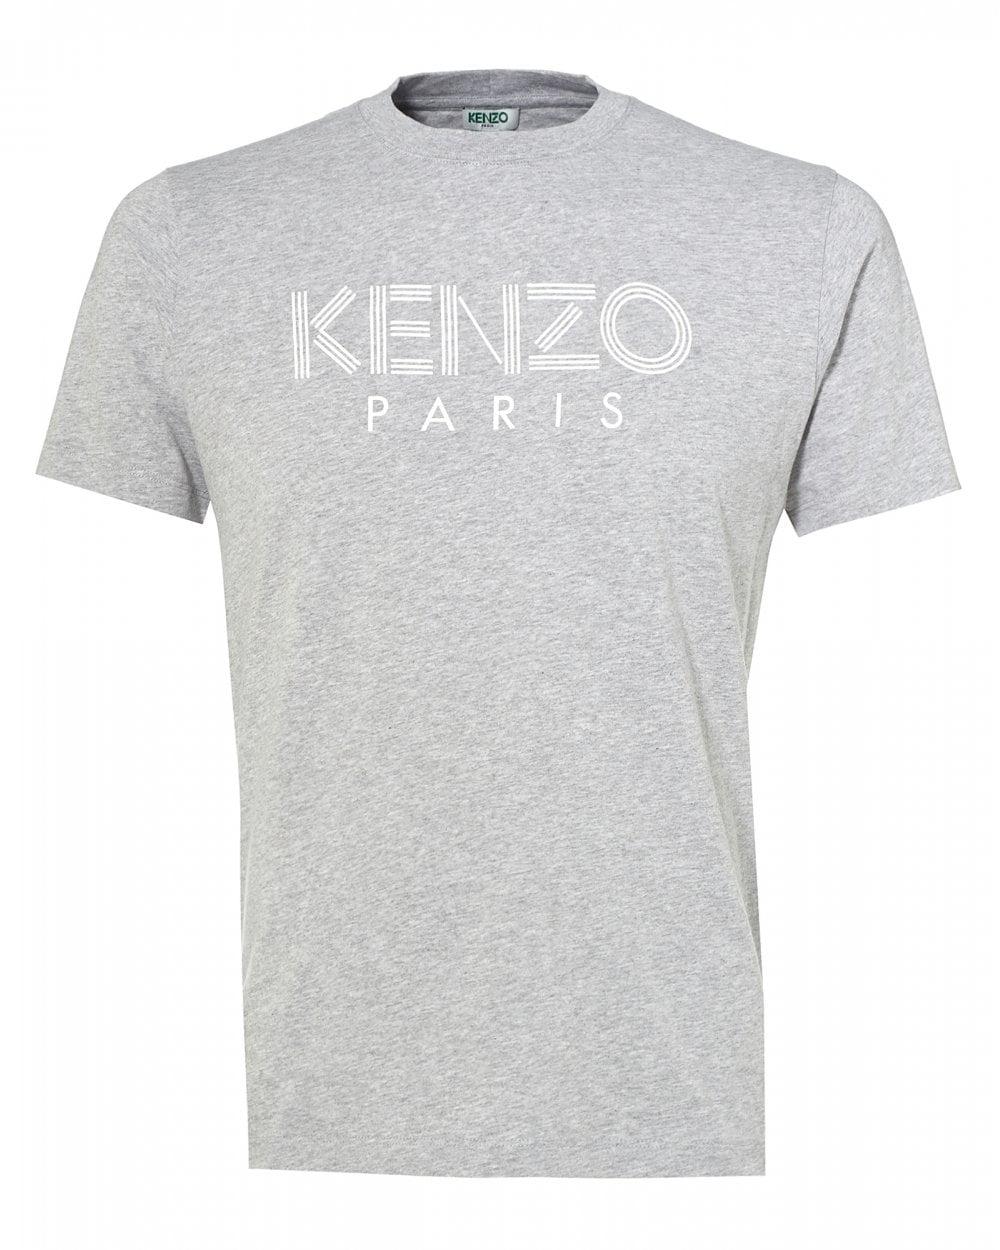 ba00fdc4 Kenzo Mens Classic Logo T-Shirt, Pearl Grey Tee